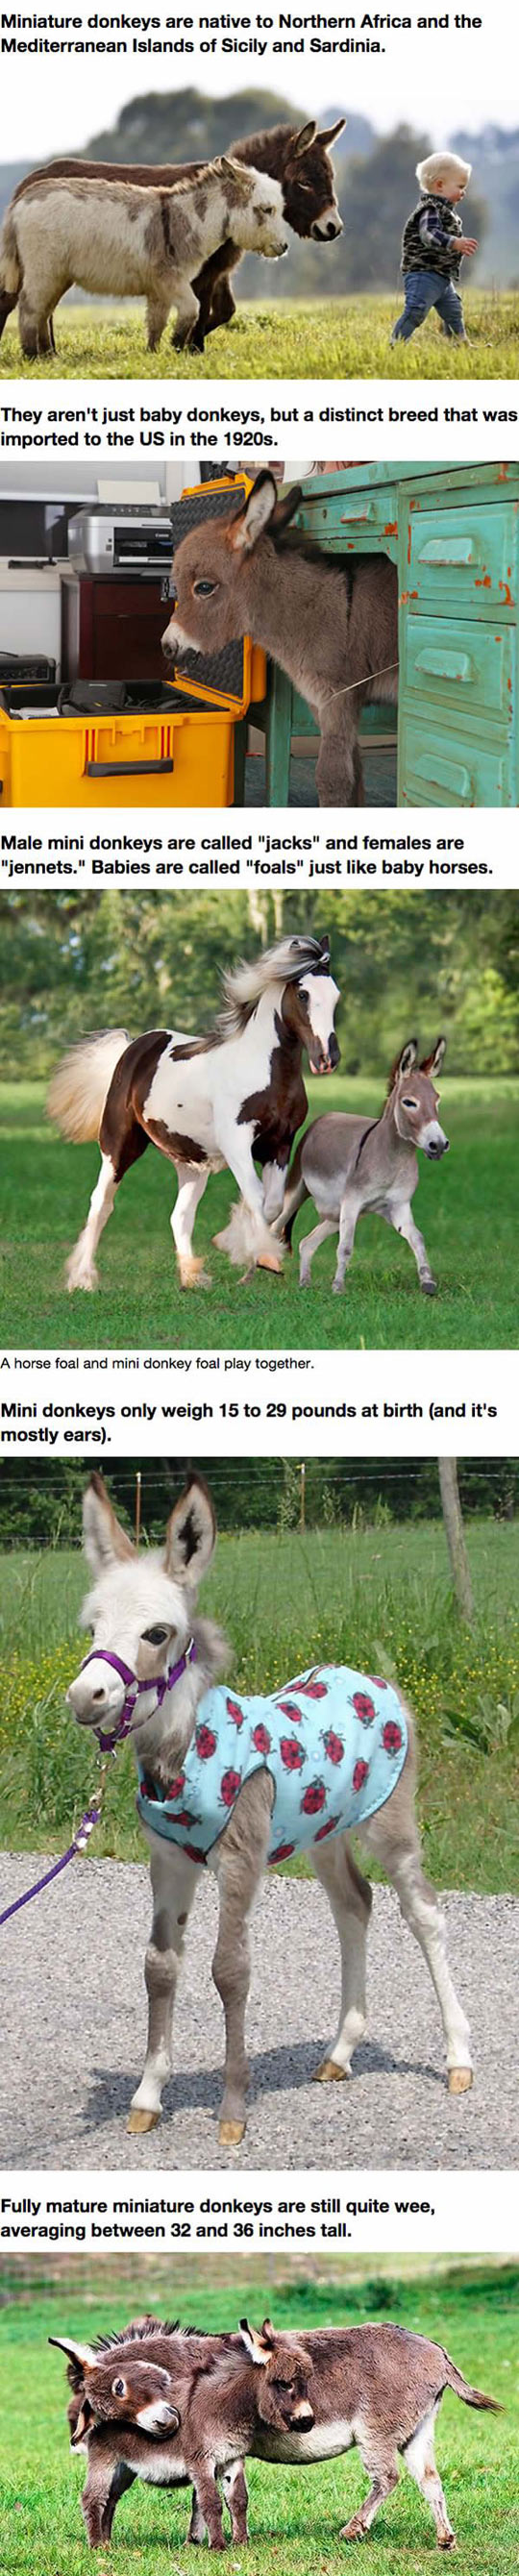 funny-mini-donkeys-dream-pet